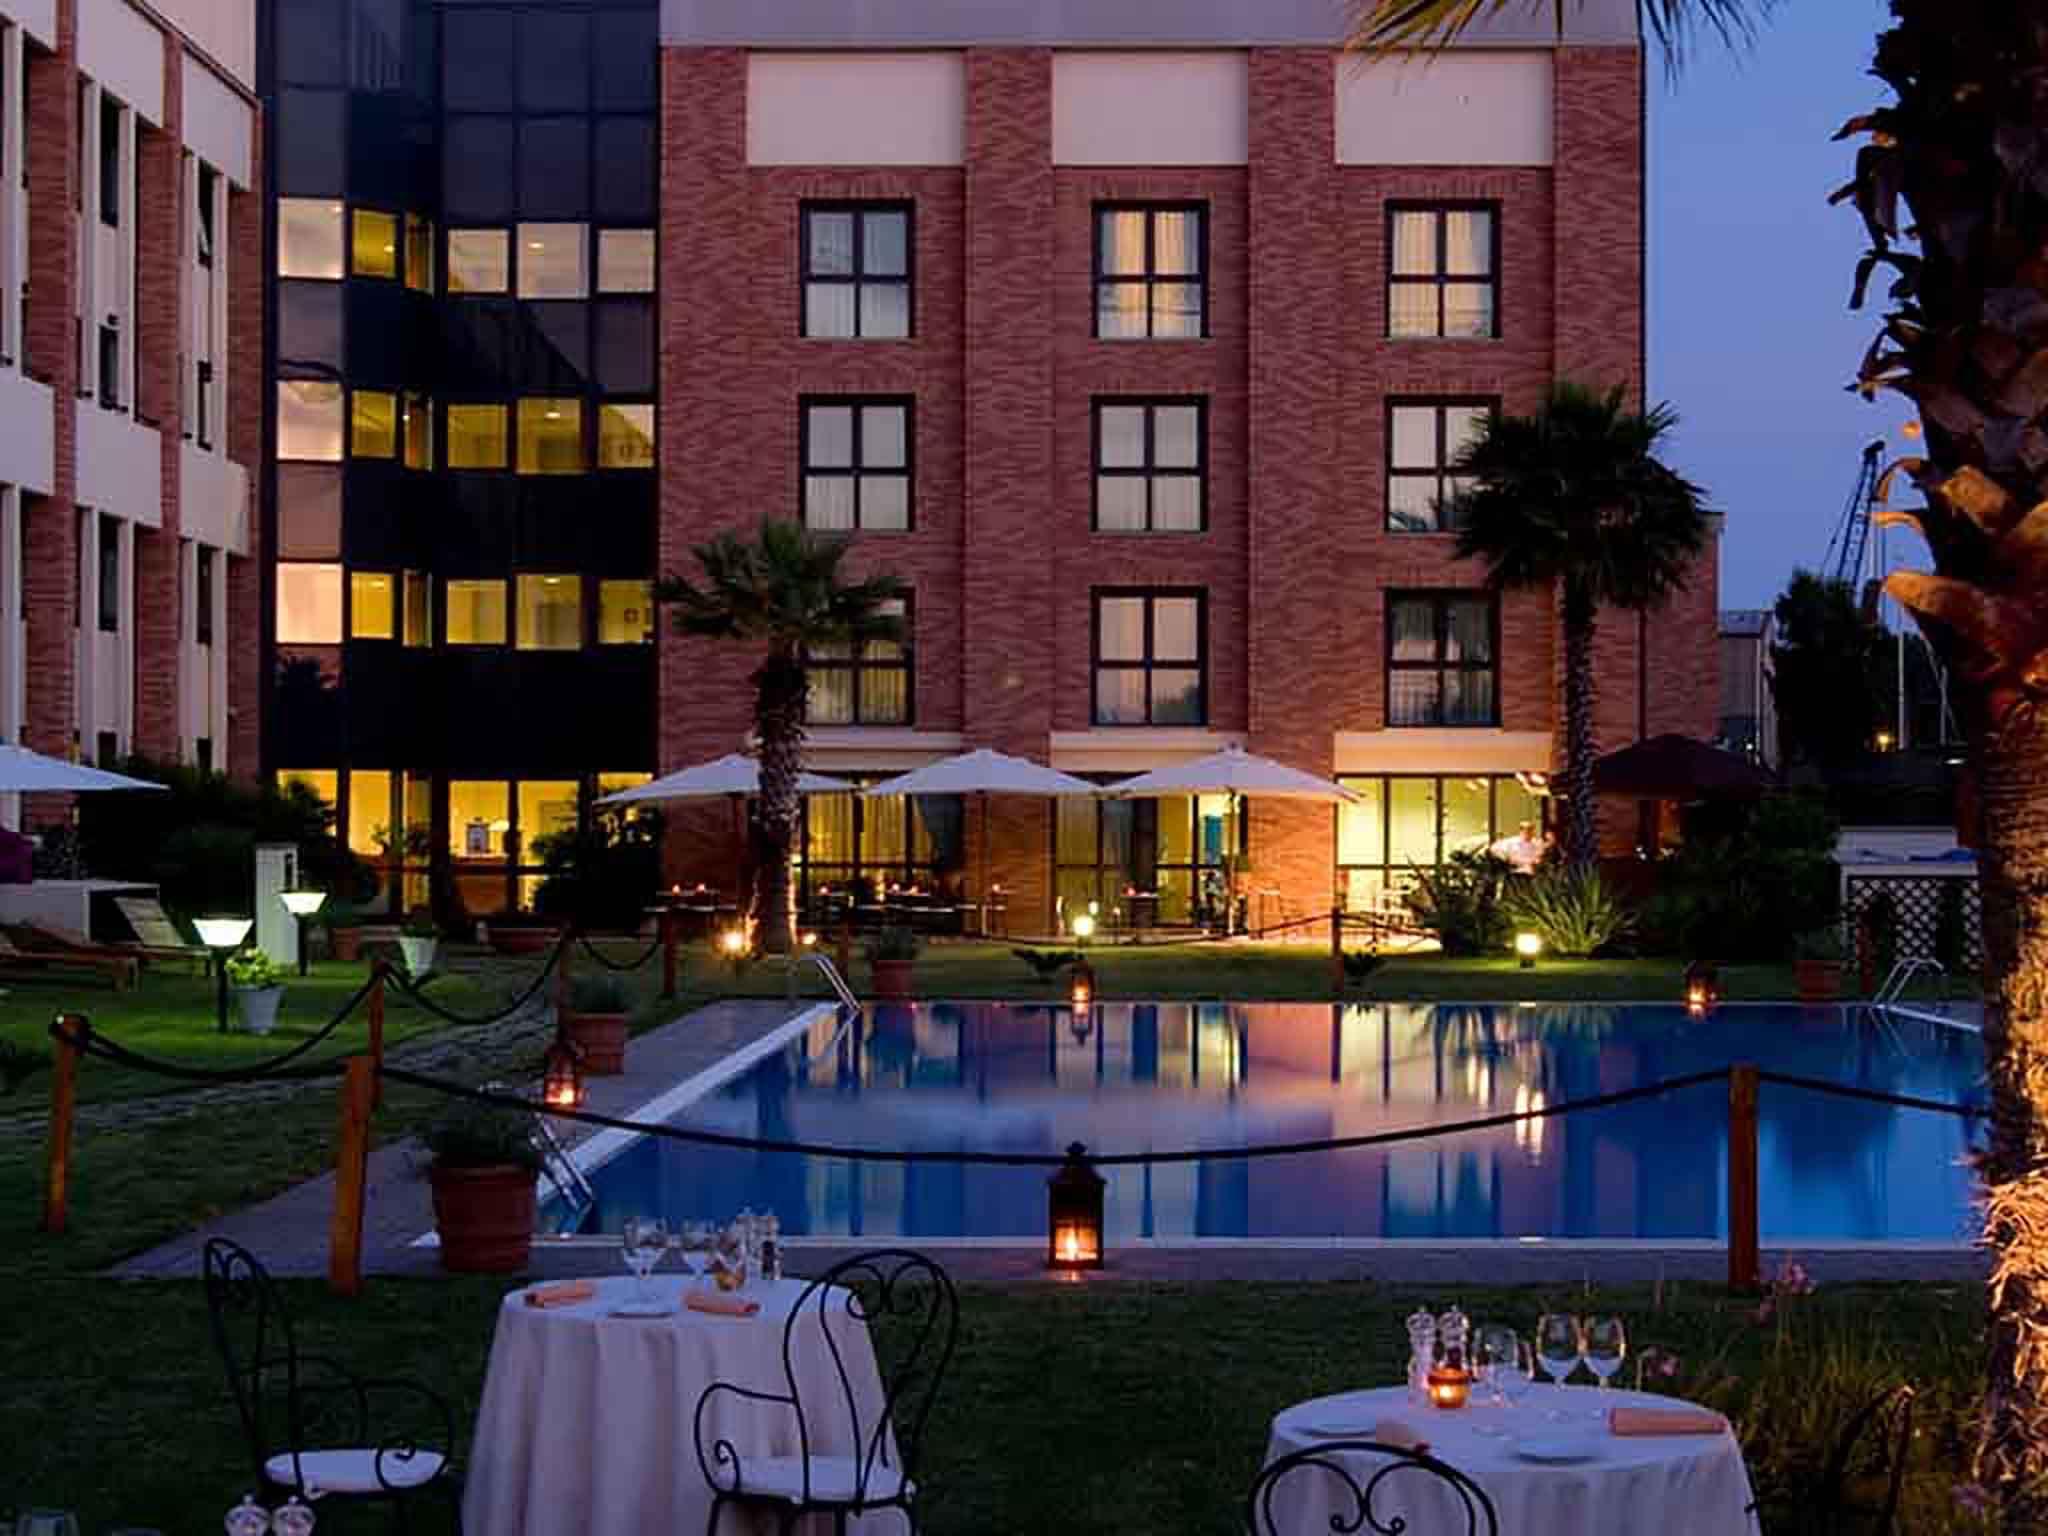 Hotel in fiumicino mercure rome leonardo da vinci airport for Hotels tours